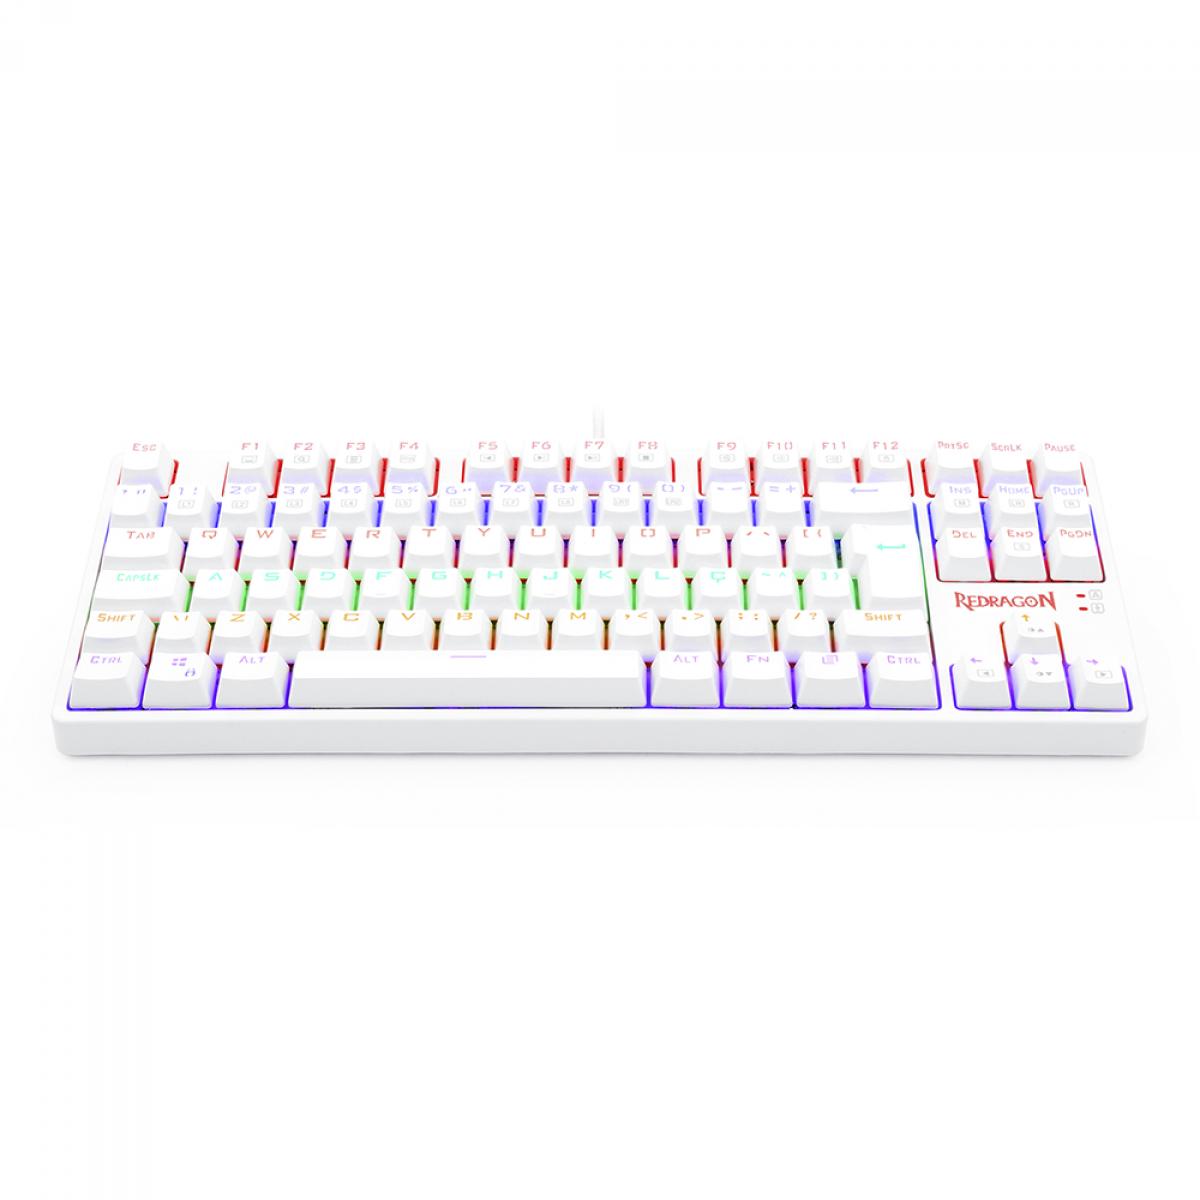 Teclado Mecânico Gamer Redragon Daksa Rainbow, Switch Red Removíveis, ABNT2, White, K576W-R PT-RED